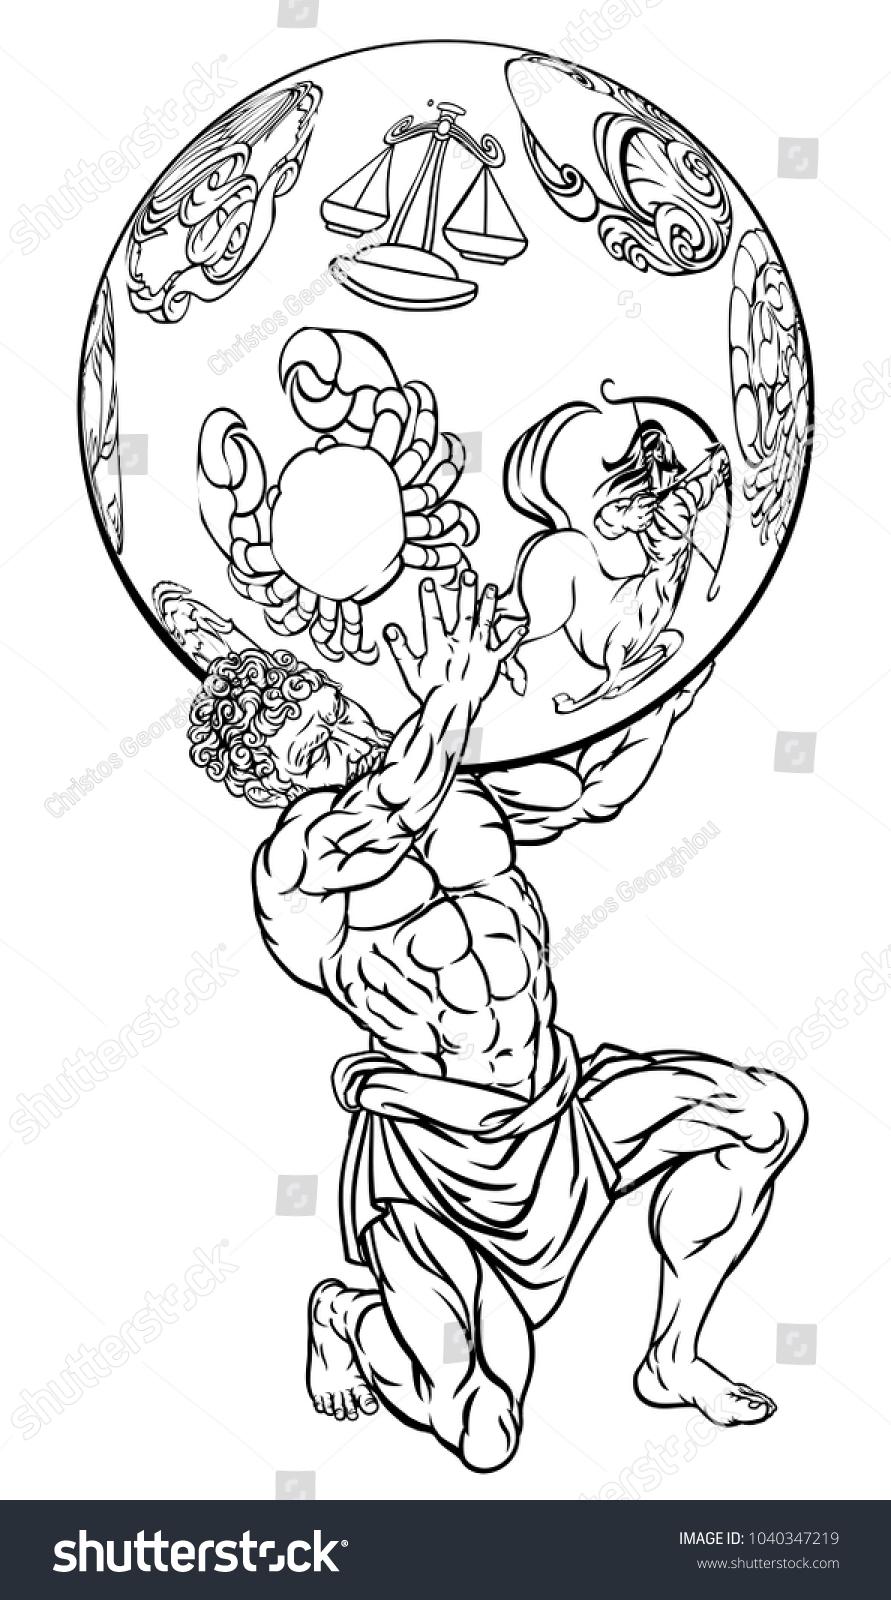 Atlas Titan Greek Mythology Holding Sky Stock Illustration